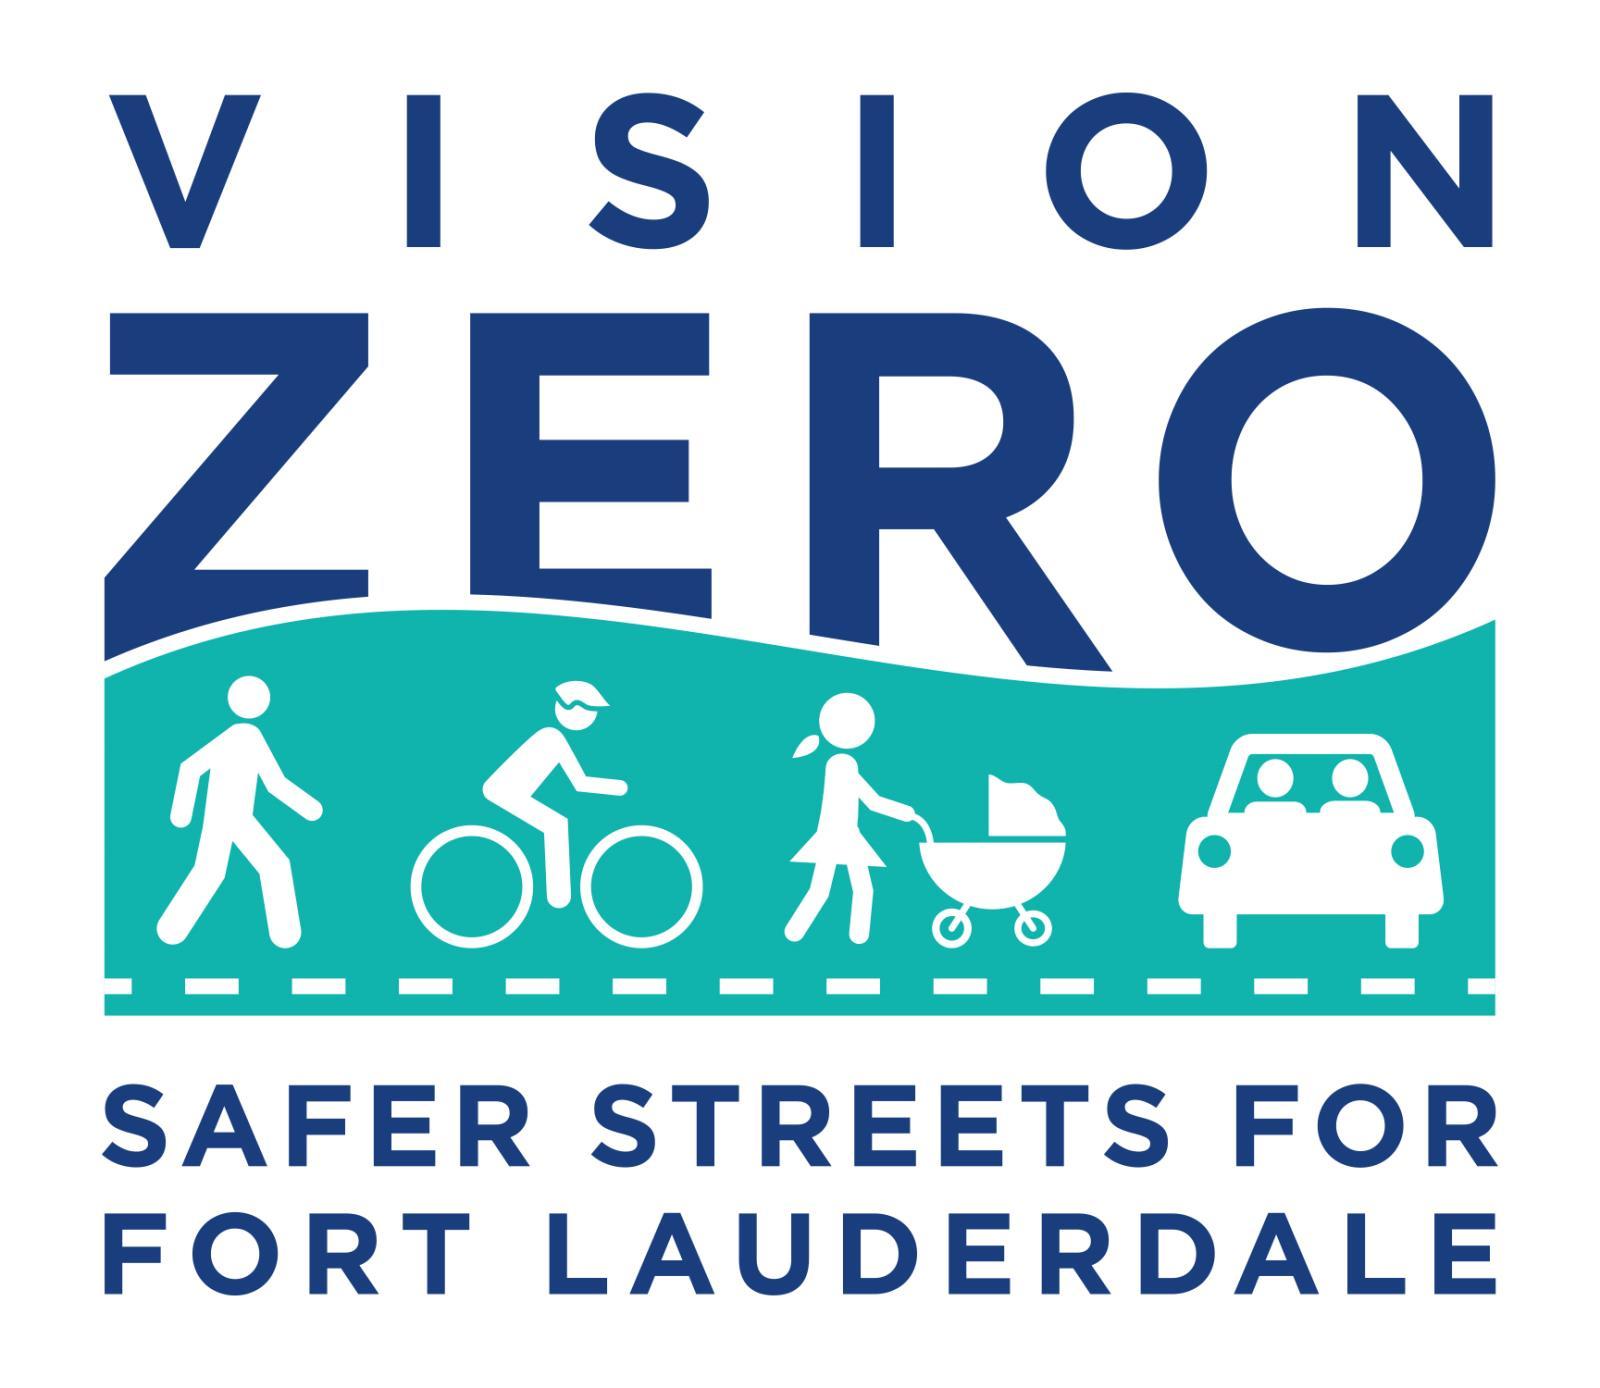 City Of Fort Lauderdale Fl Vision Zero Safer Streets For Fort Lauderdale